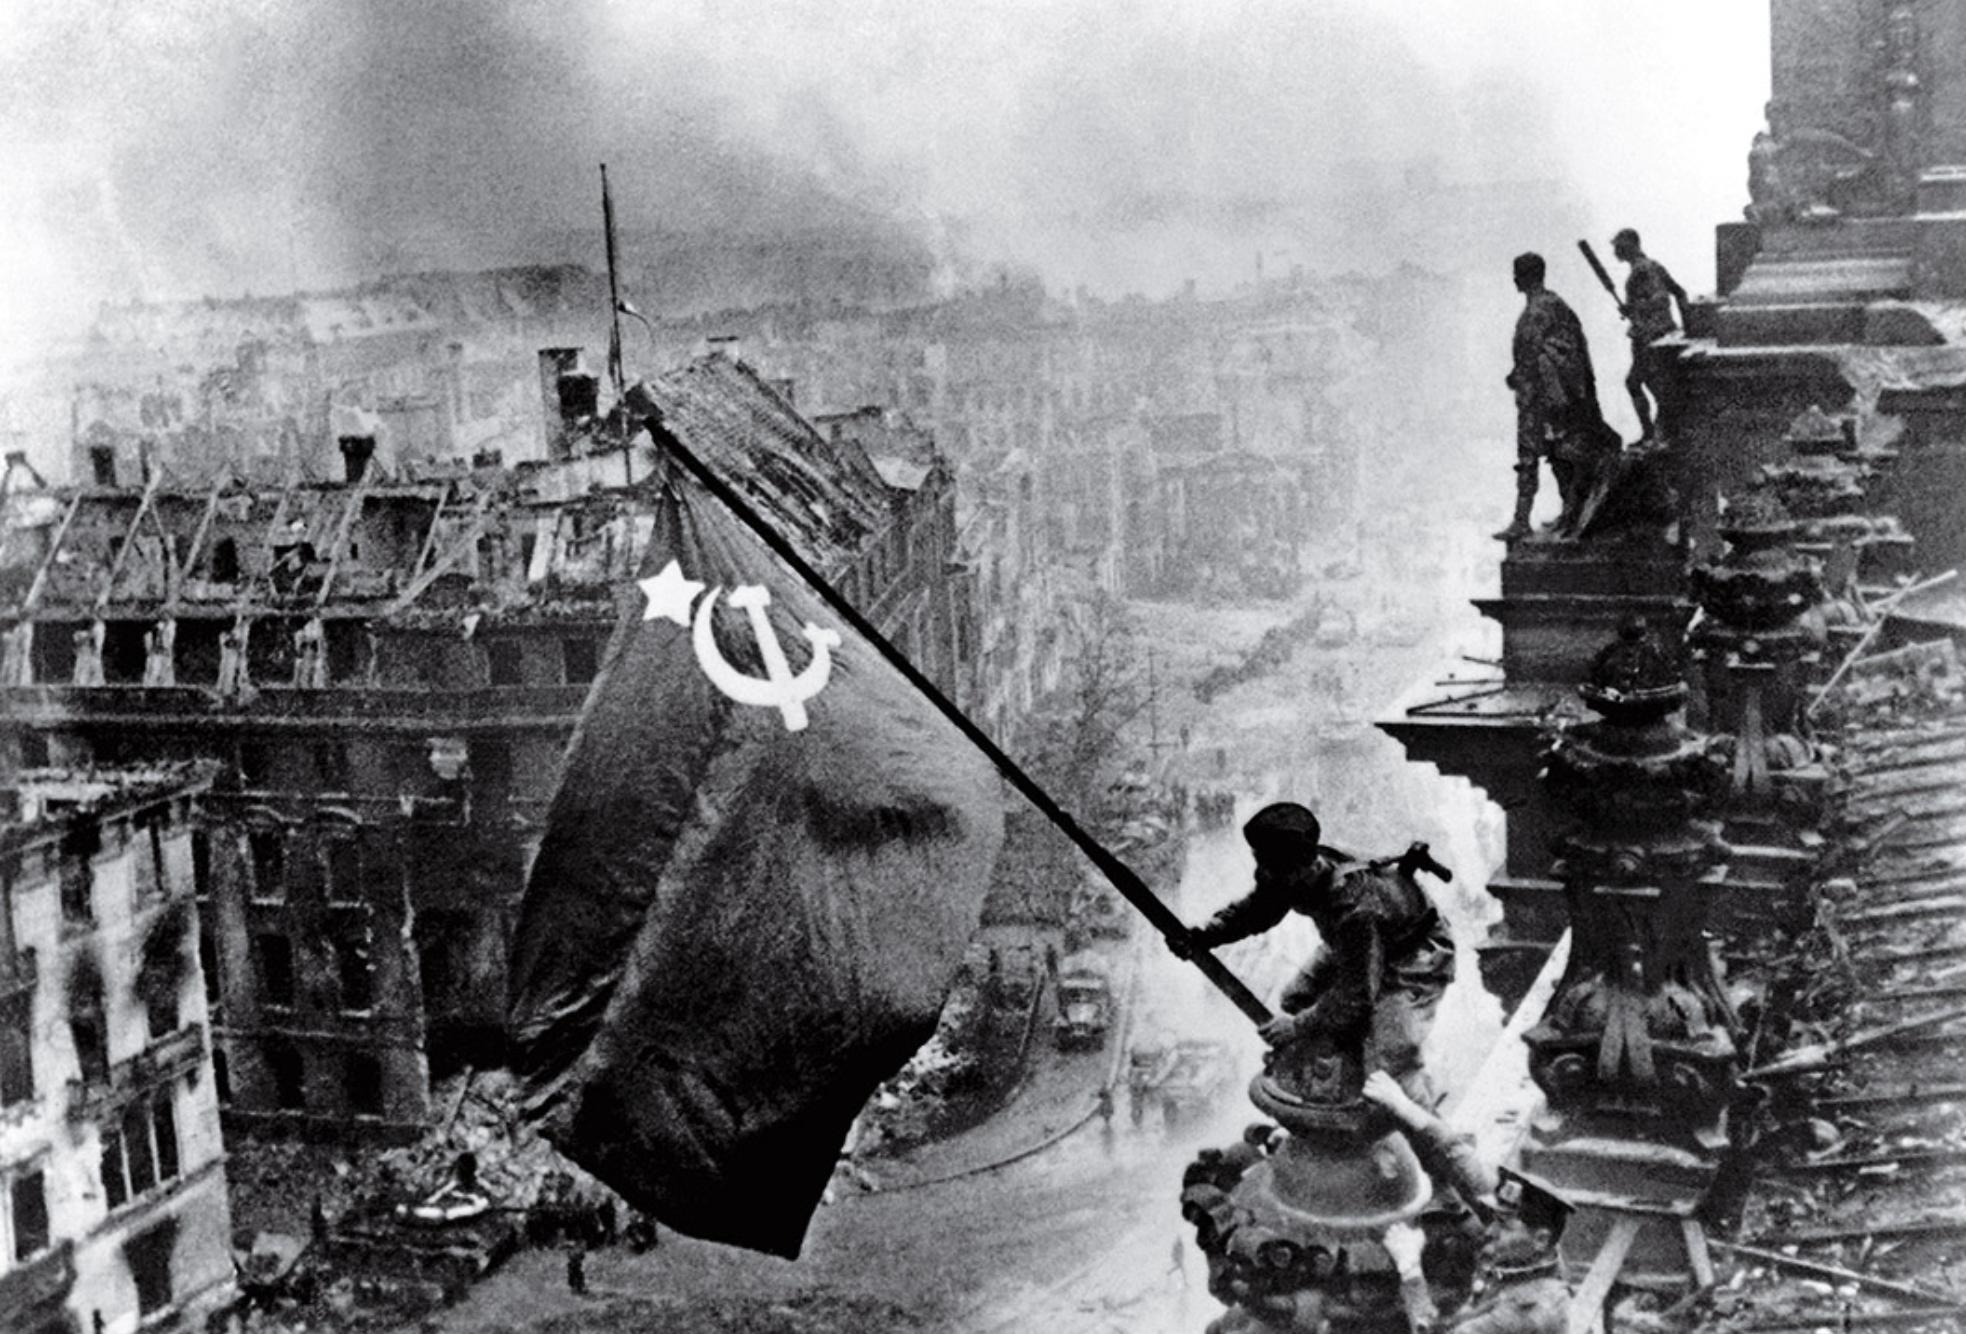 Raising the Flag over The Reichstag (Pic: Yevgeny Khaldei/TASS)